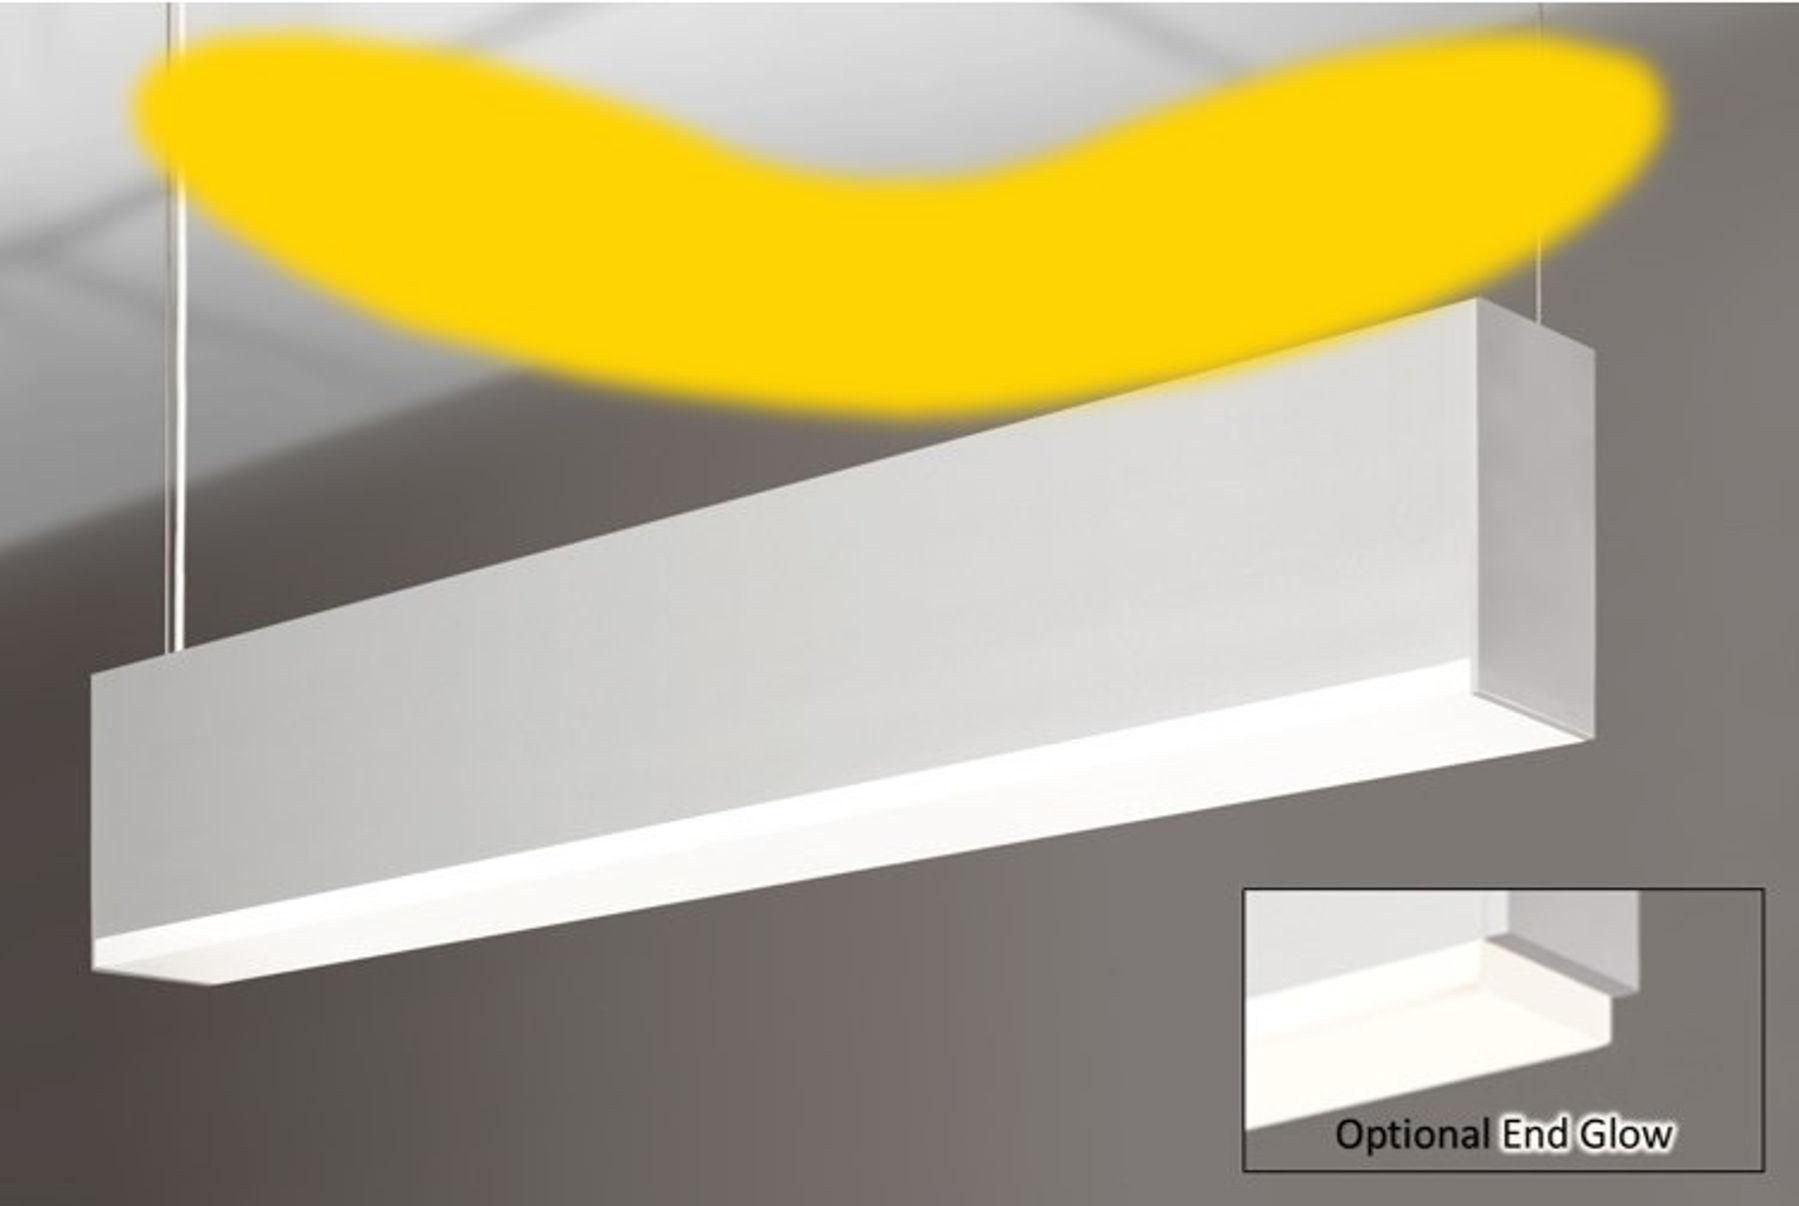 Picture of GX3D35B2-LED-GGO-LENS3D